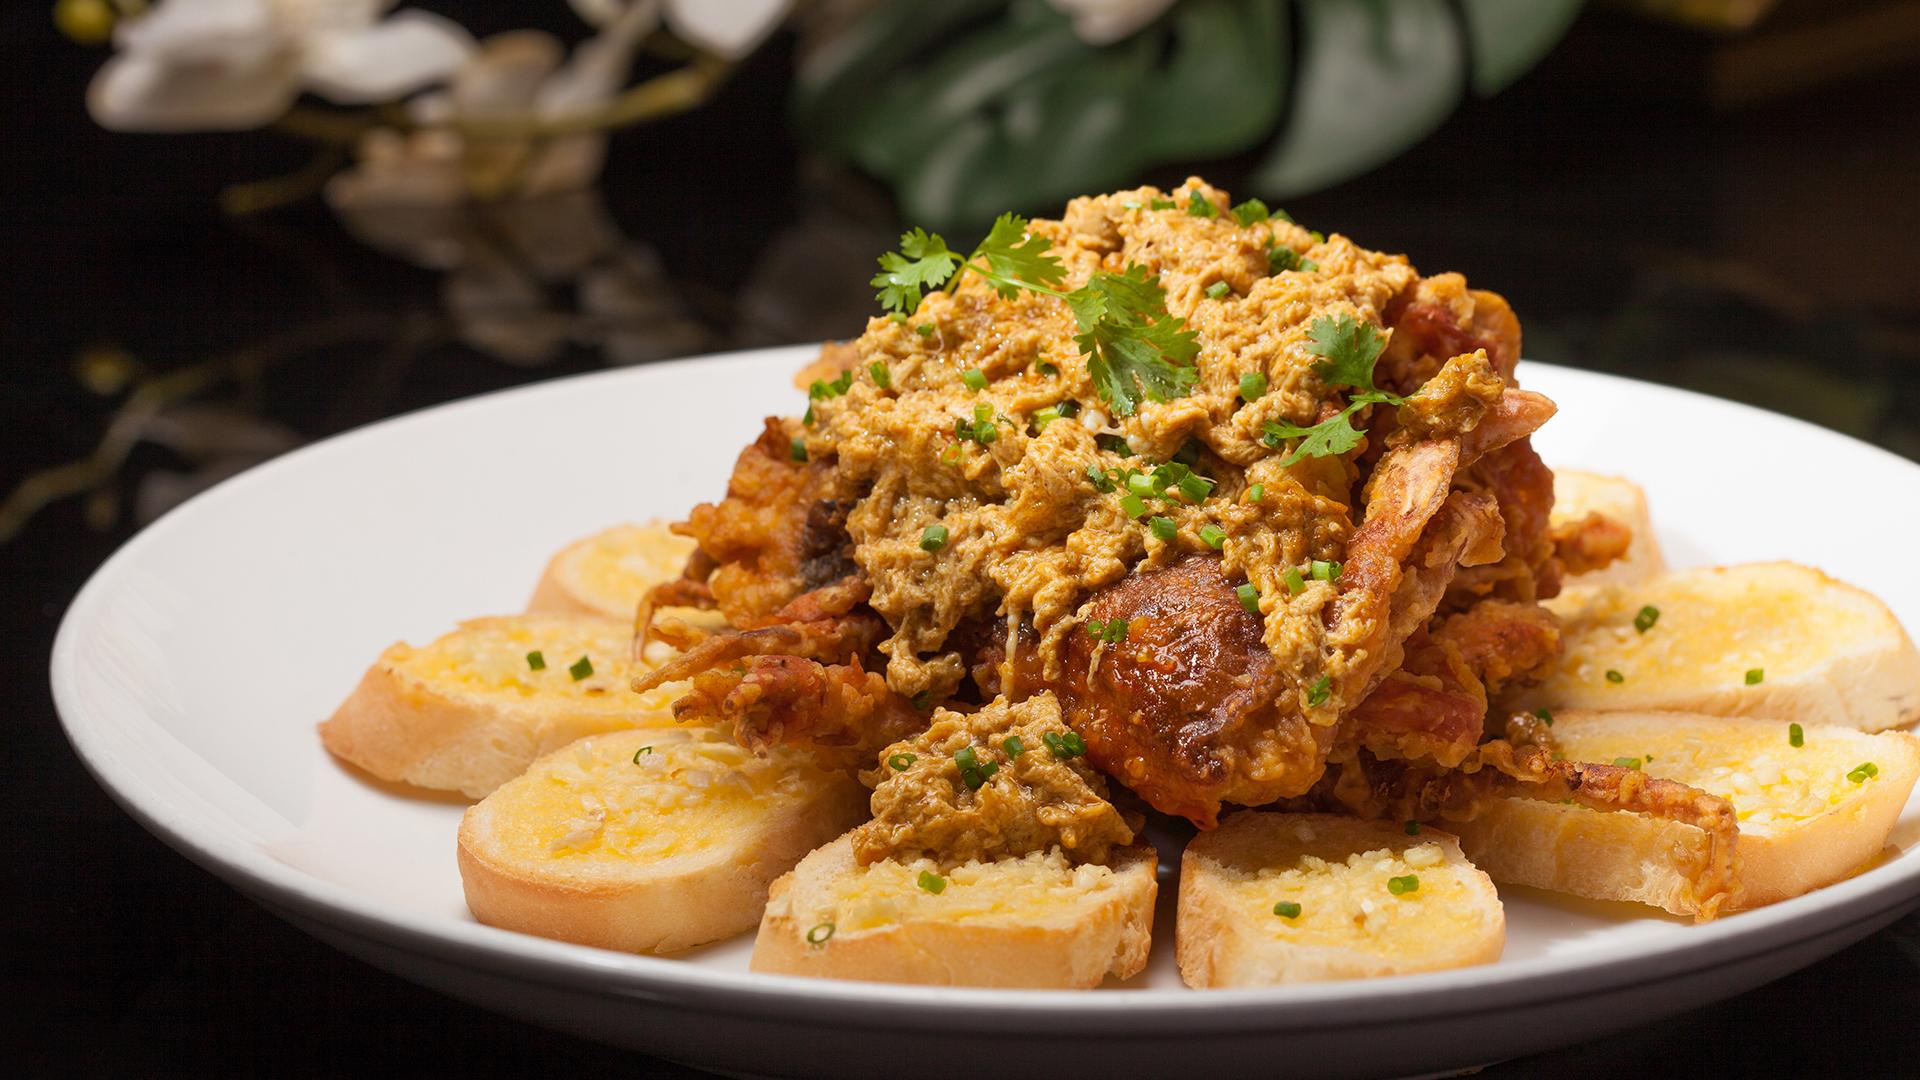 Taiming Lanpin 咖哩軟殼蟹佐法國麵包